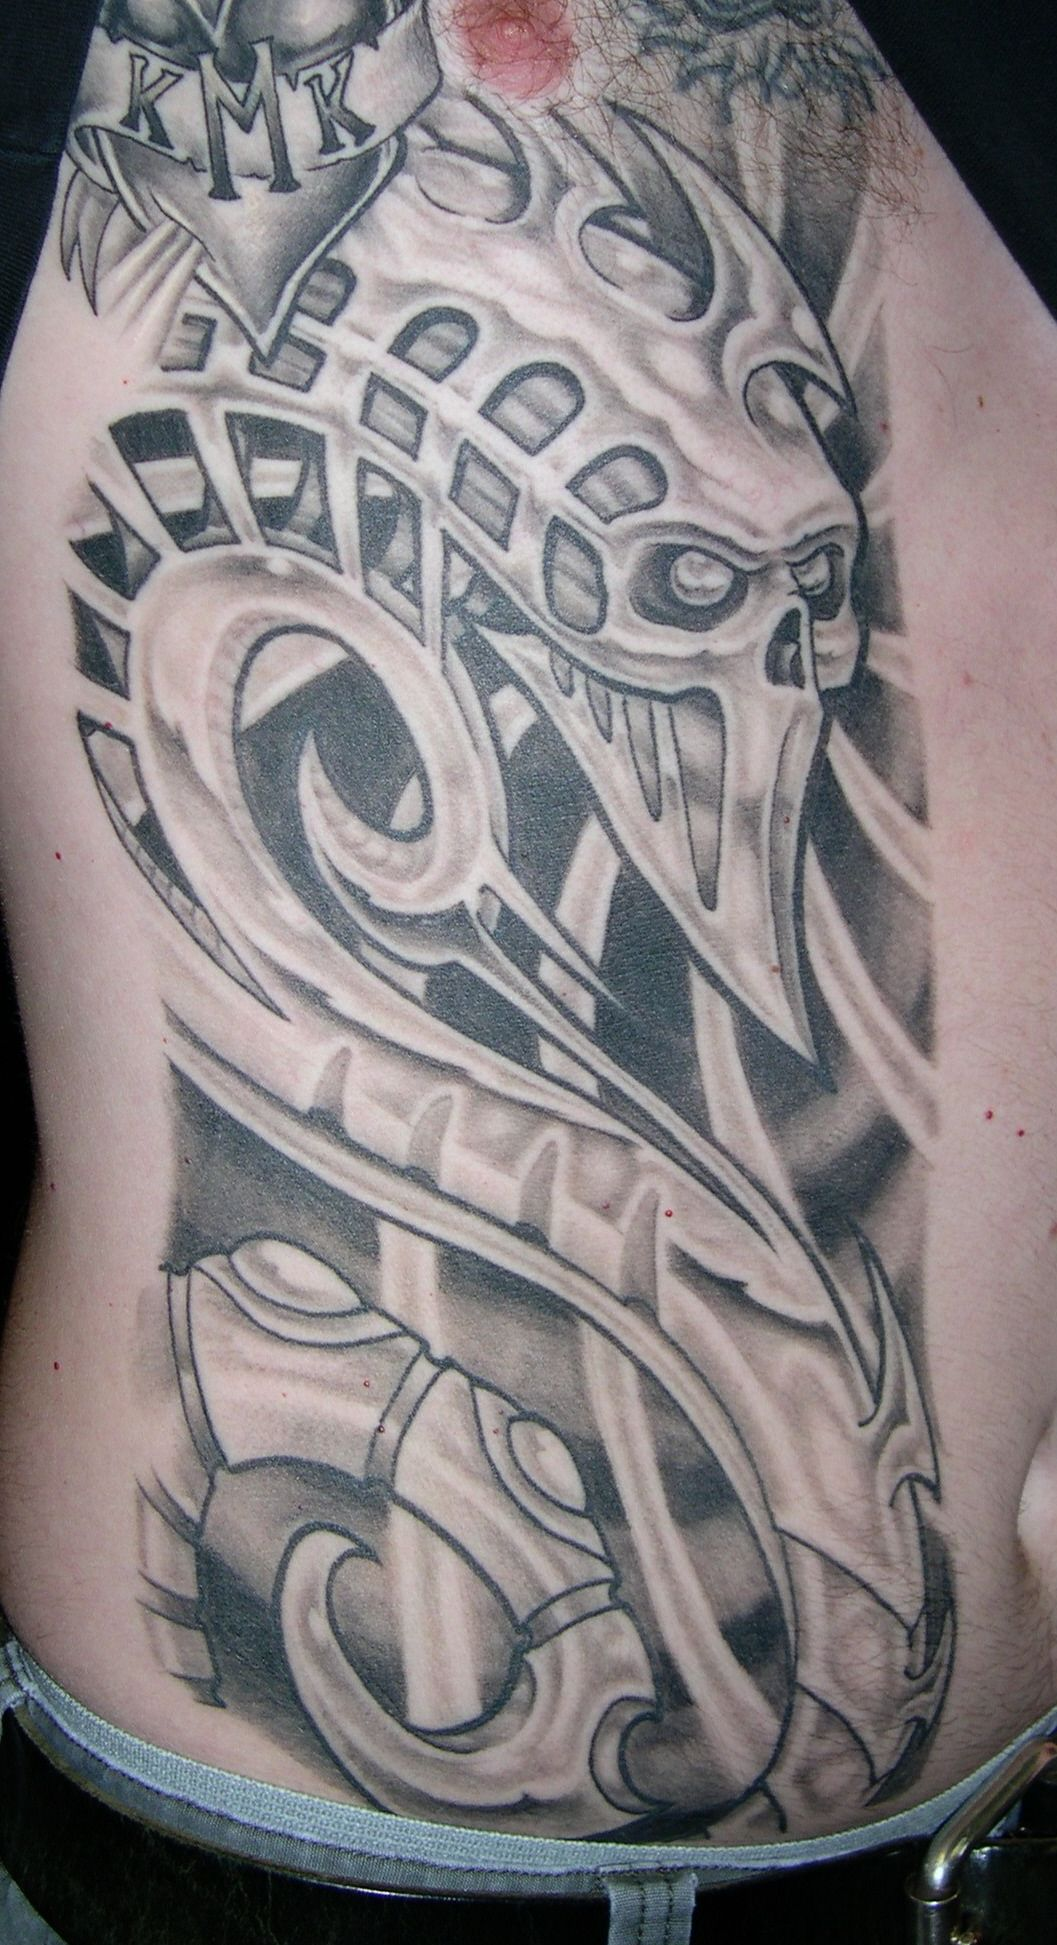 Biomechanical tattoos designs - Biomechanical Tattoos Designs Ideas